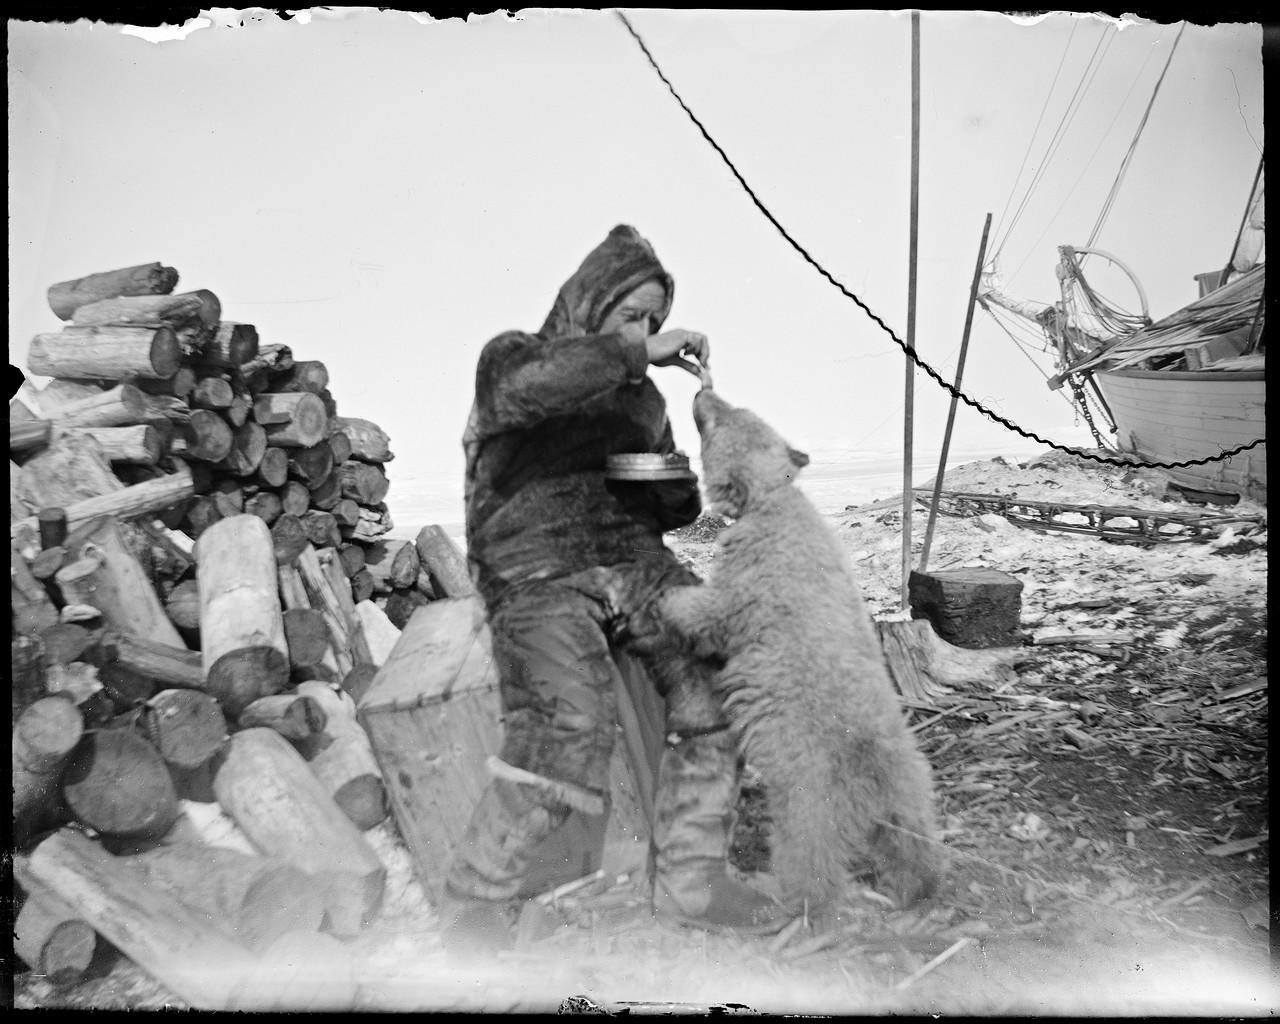 NPRA1794._Roald_Amundsen_mater_isbjørnungen__Marie__-_Roald_Amundsen_feeding_the_polar_bear__Marie__(29362931942)Чукотка, июнь1920.jpg